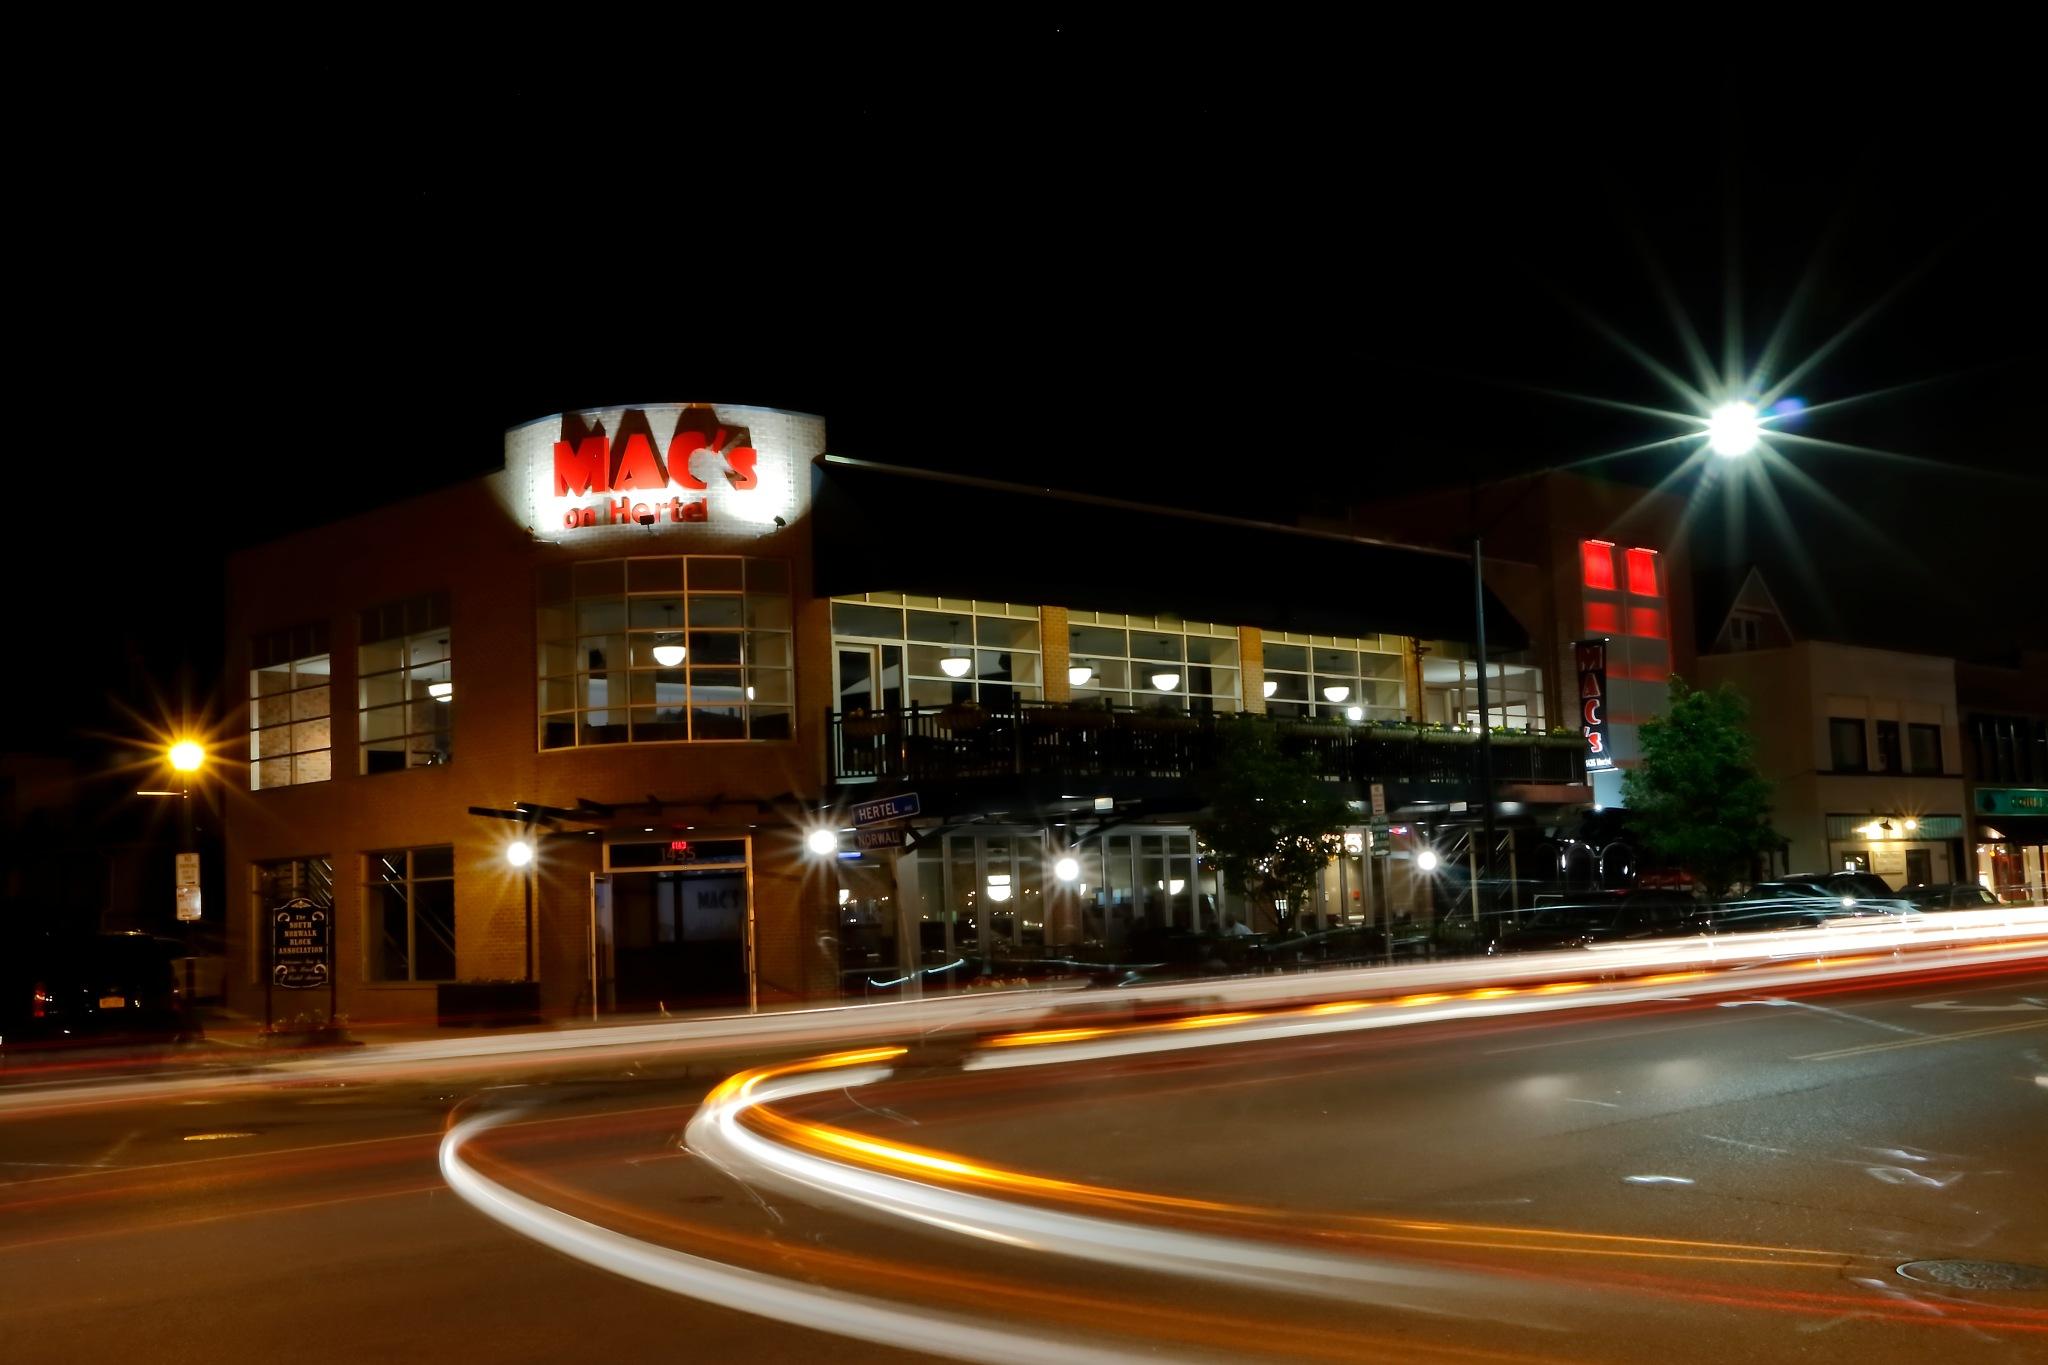 Restaurant Mac's on Hertel by Daniel J. Ruggiero